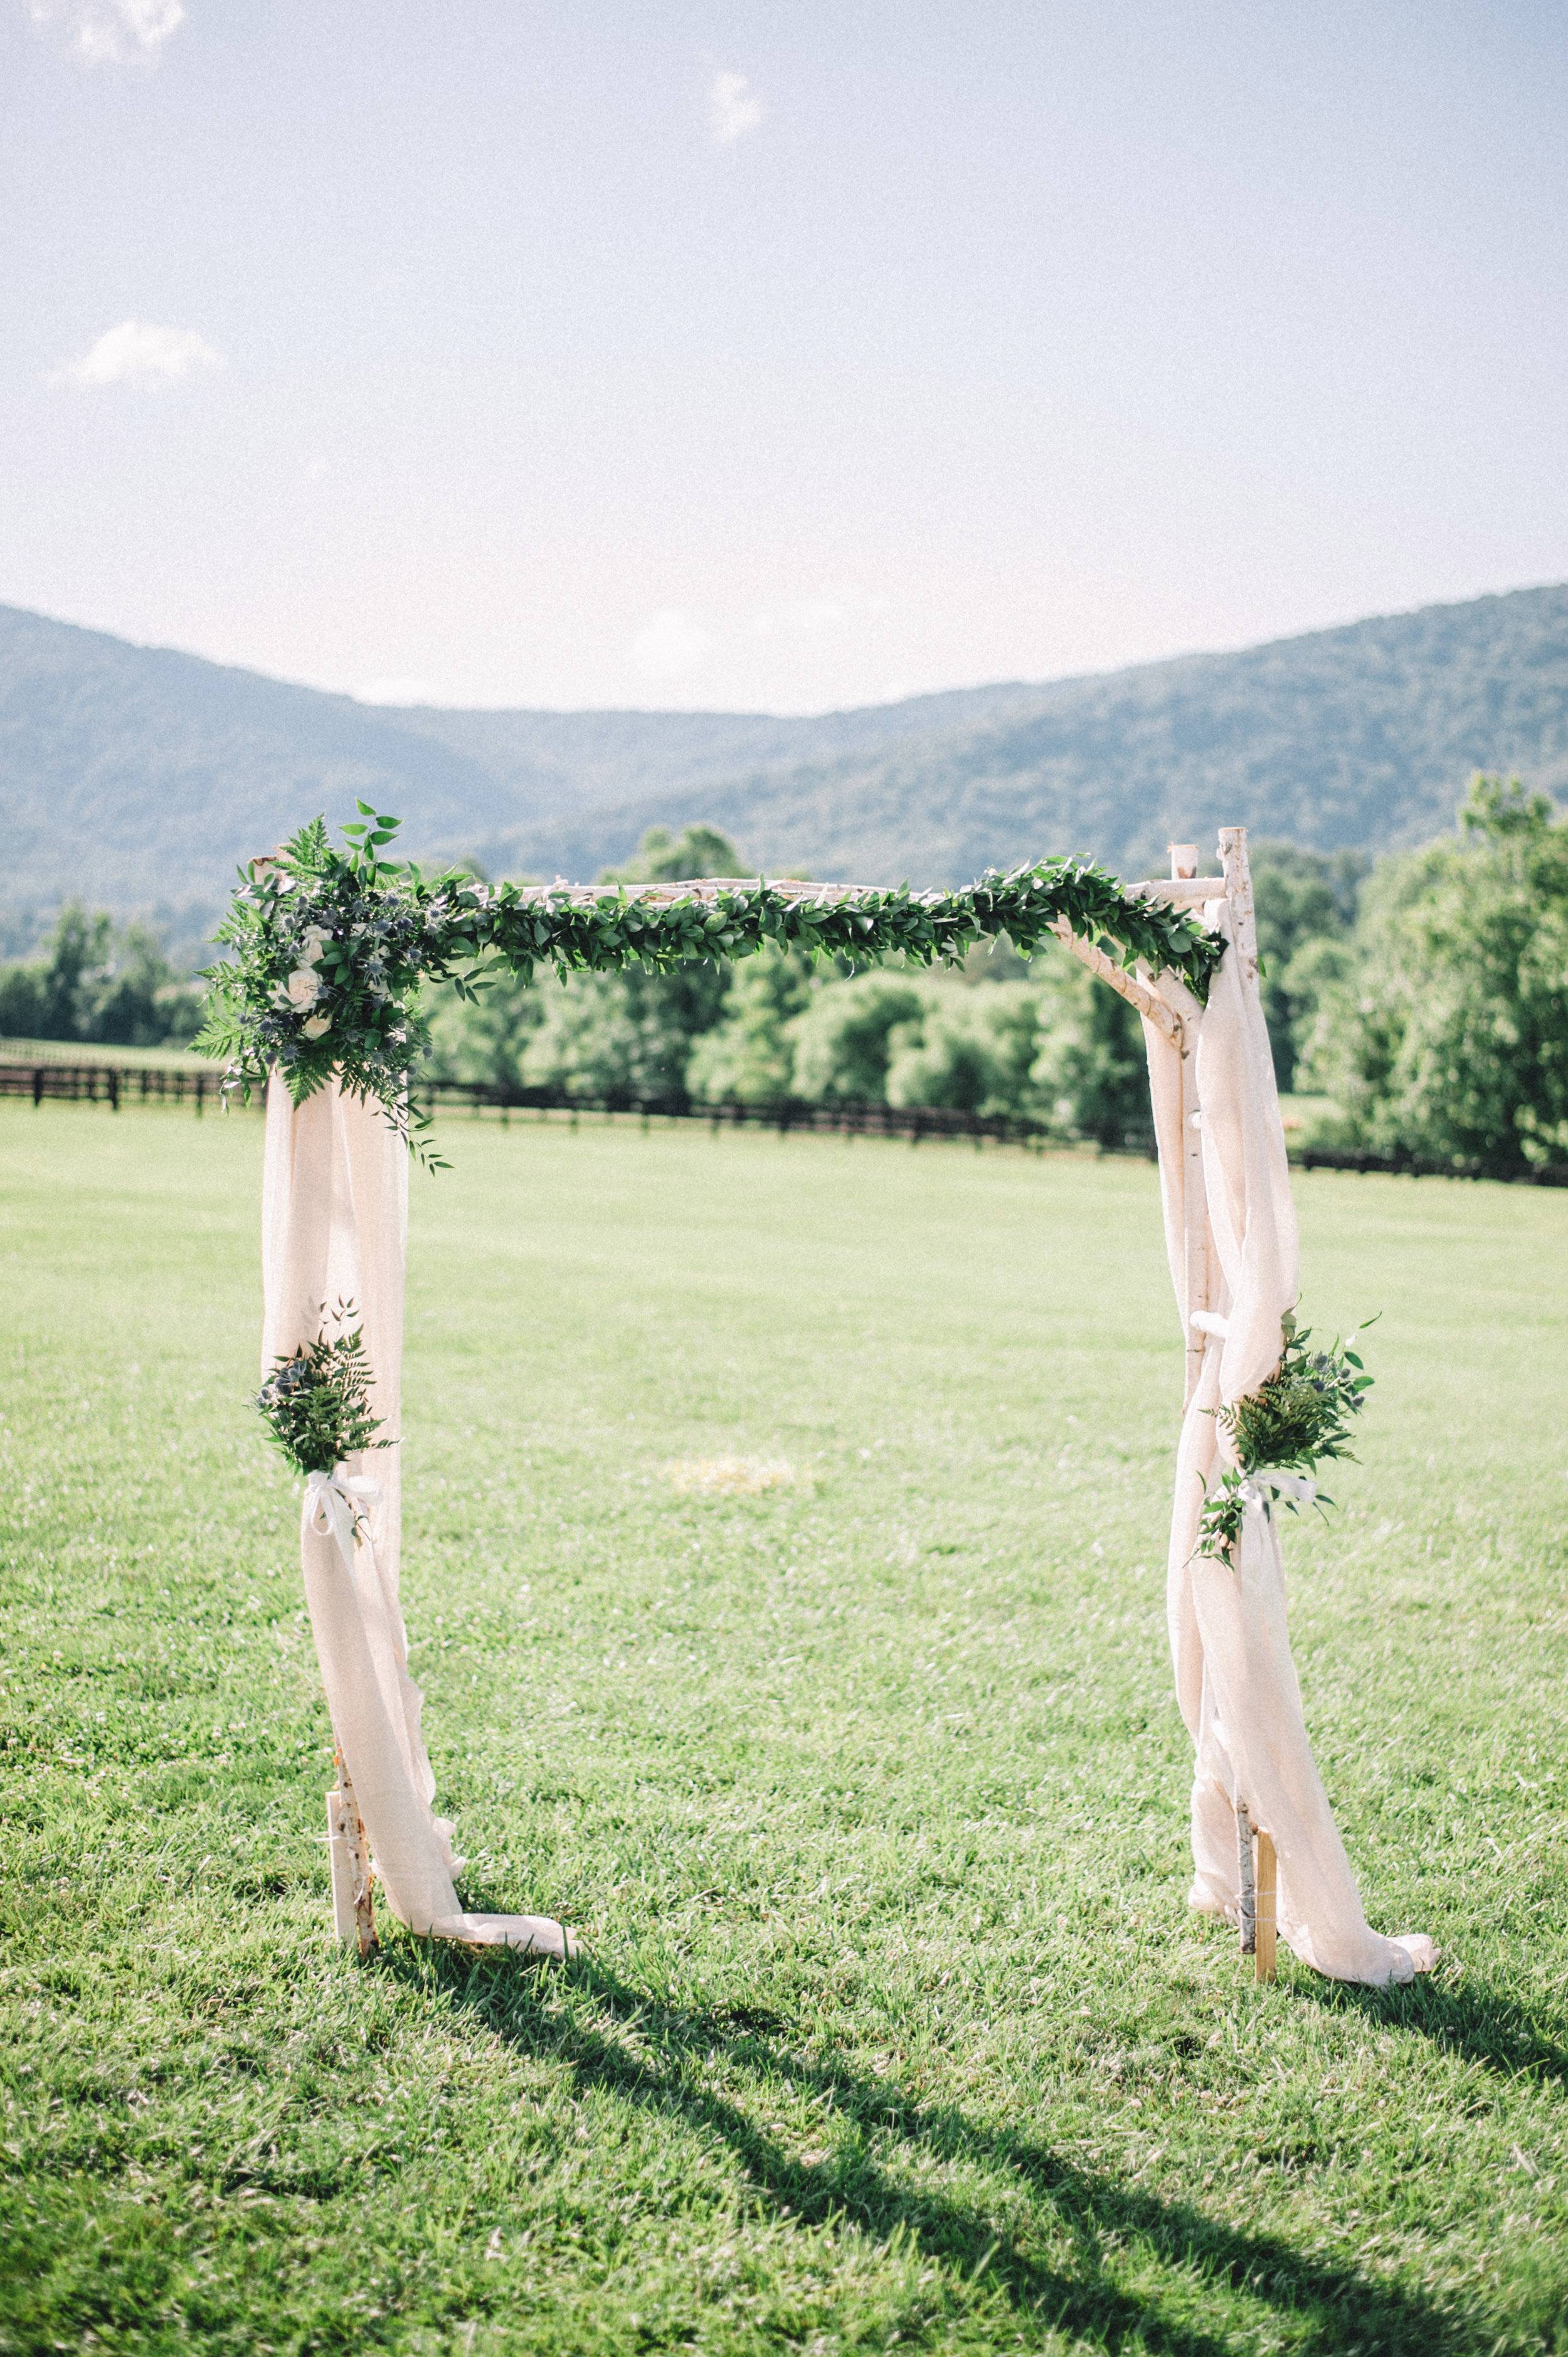 Sarah Houston Photography - cOMING SOON: Mike & Alison's King Family Vineyards Wedding